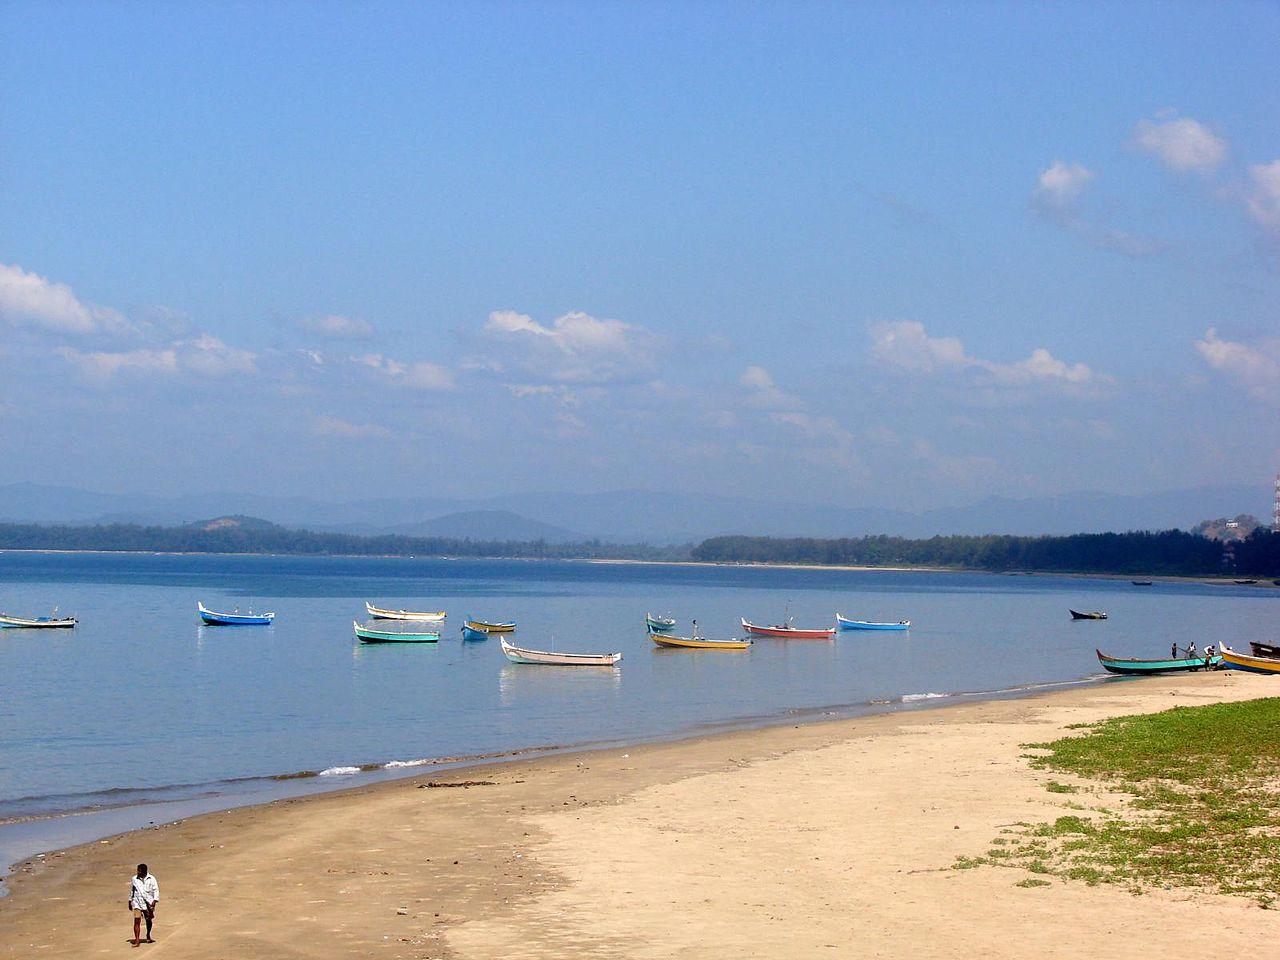 Why Should You Visit The Karwar Beach In Karwar?